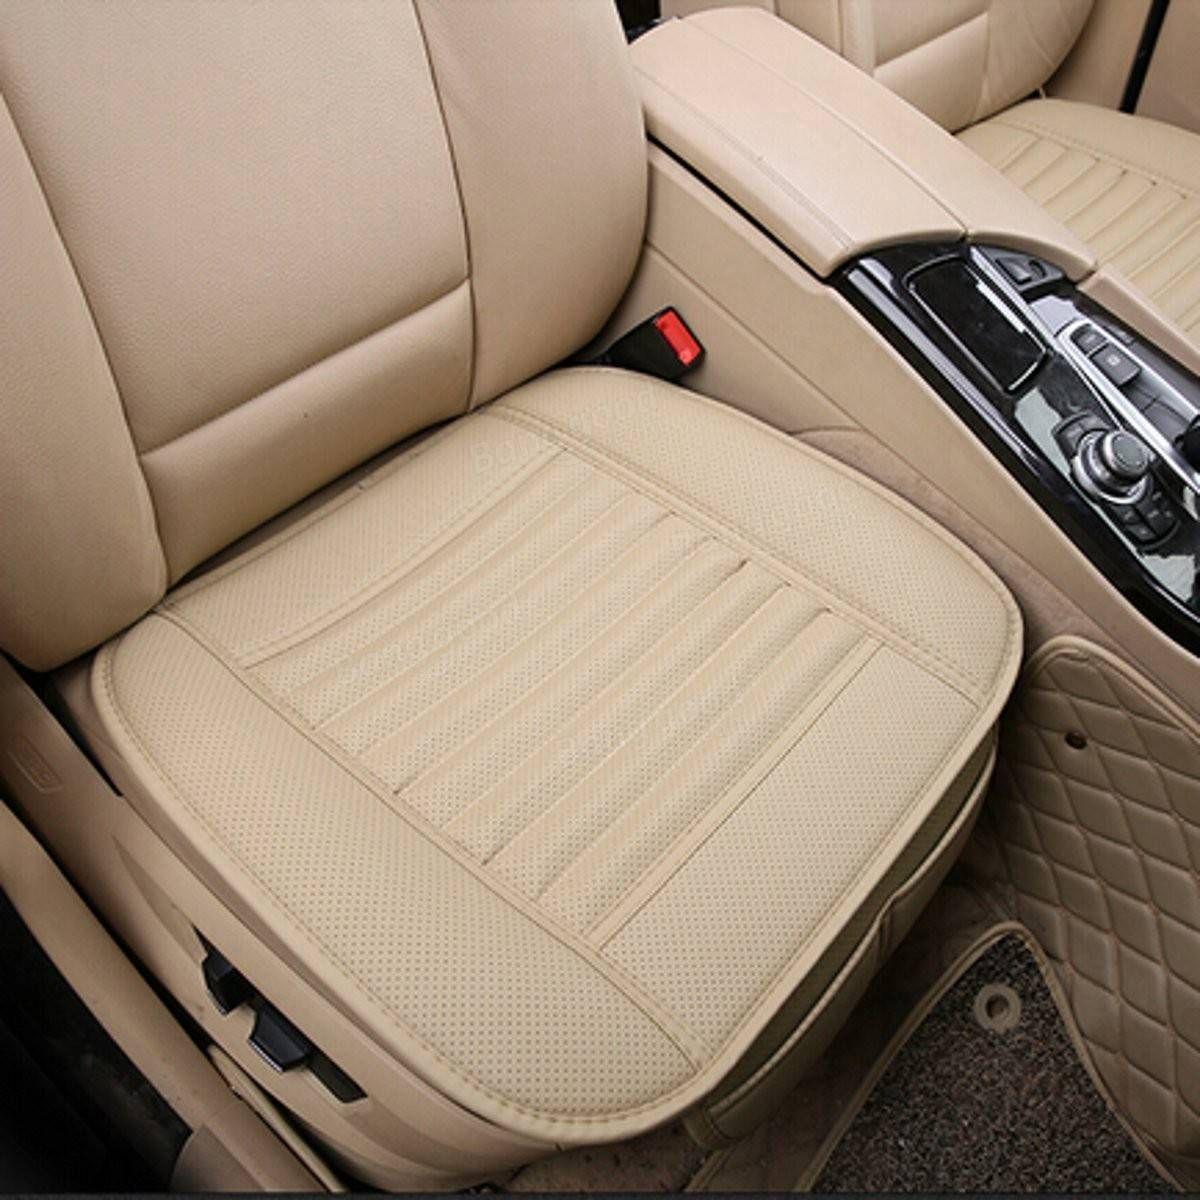 Universal Seat Pad Pu Leather Bamboo Charcoal Car Cushions Car